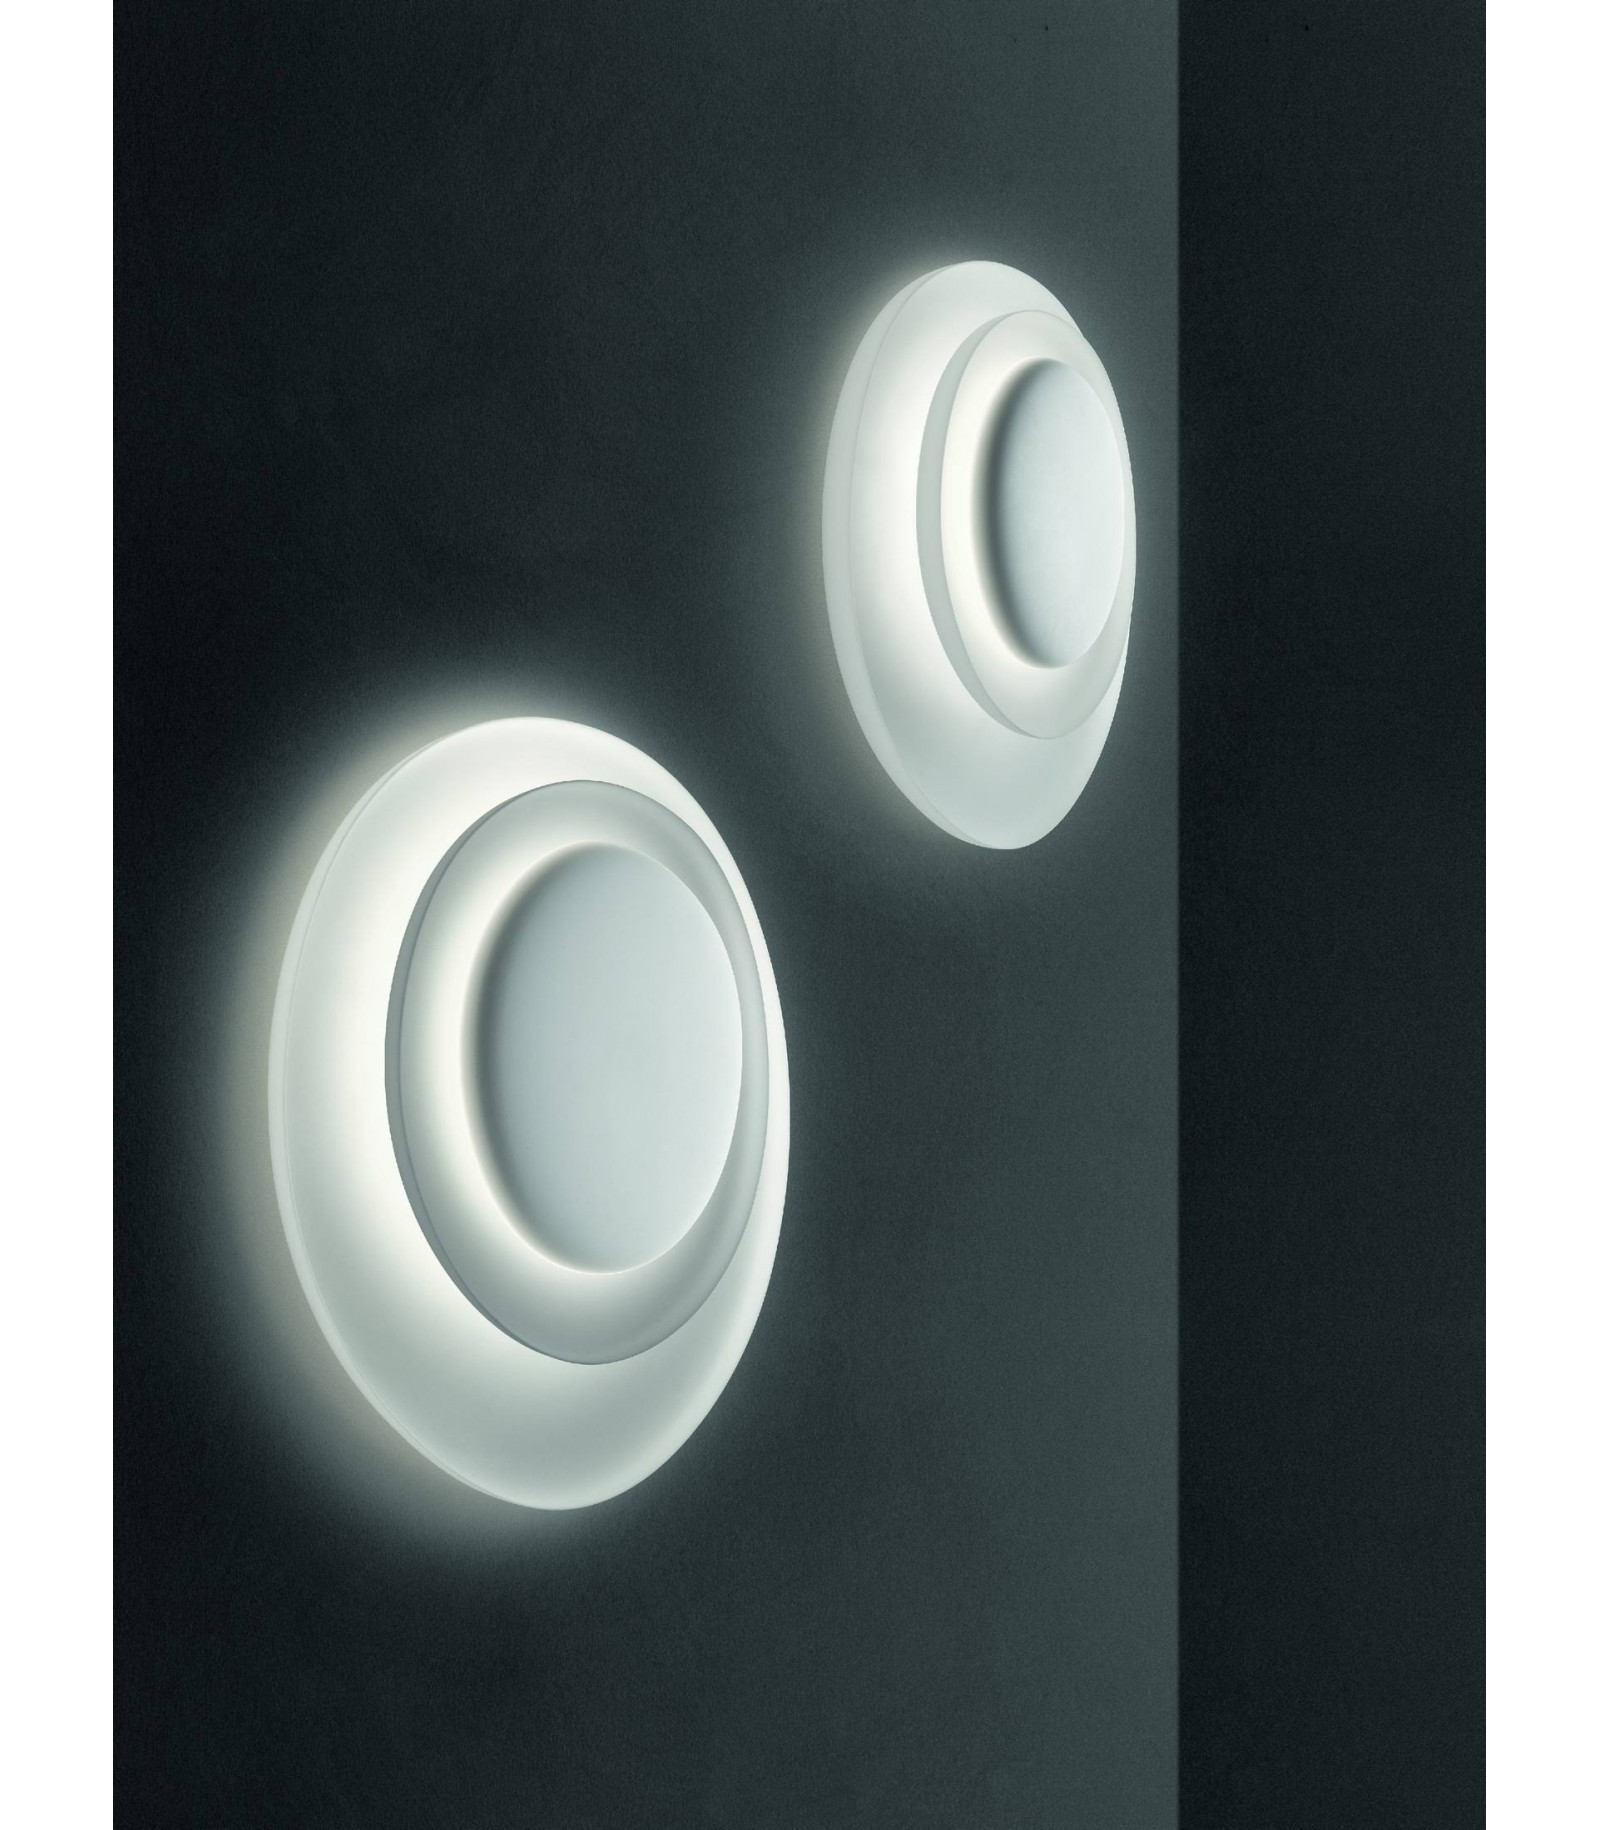 Lampada da parete foscarini bahia - Lampade a parete design ...